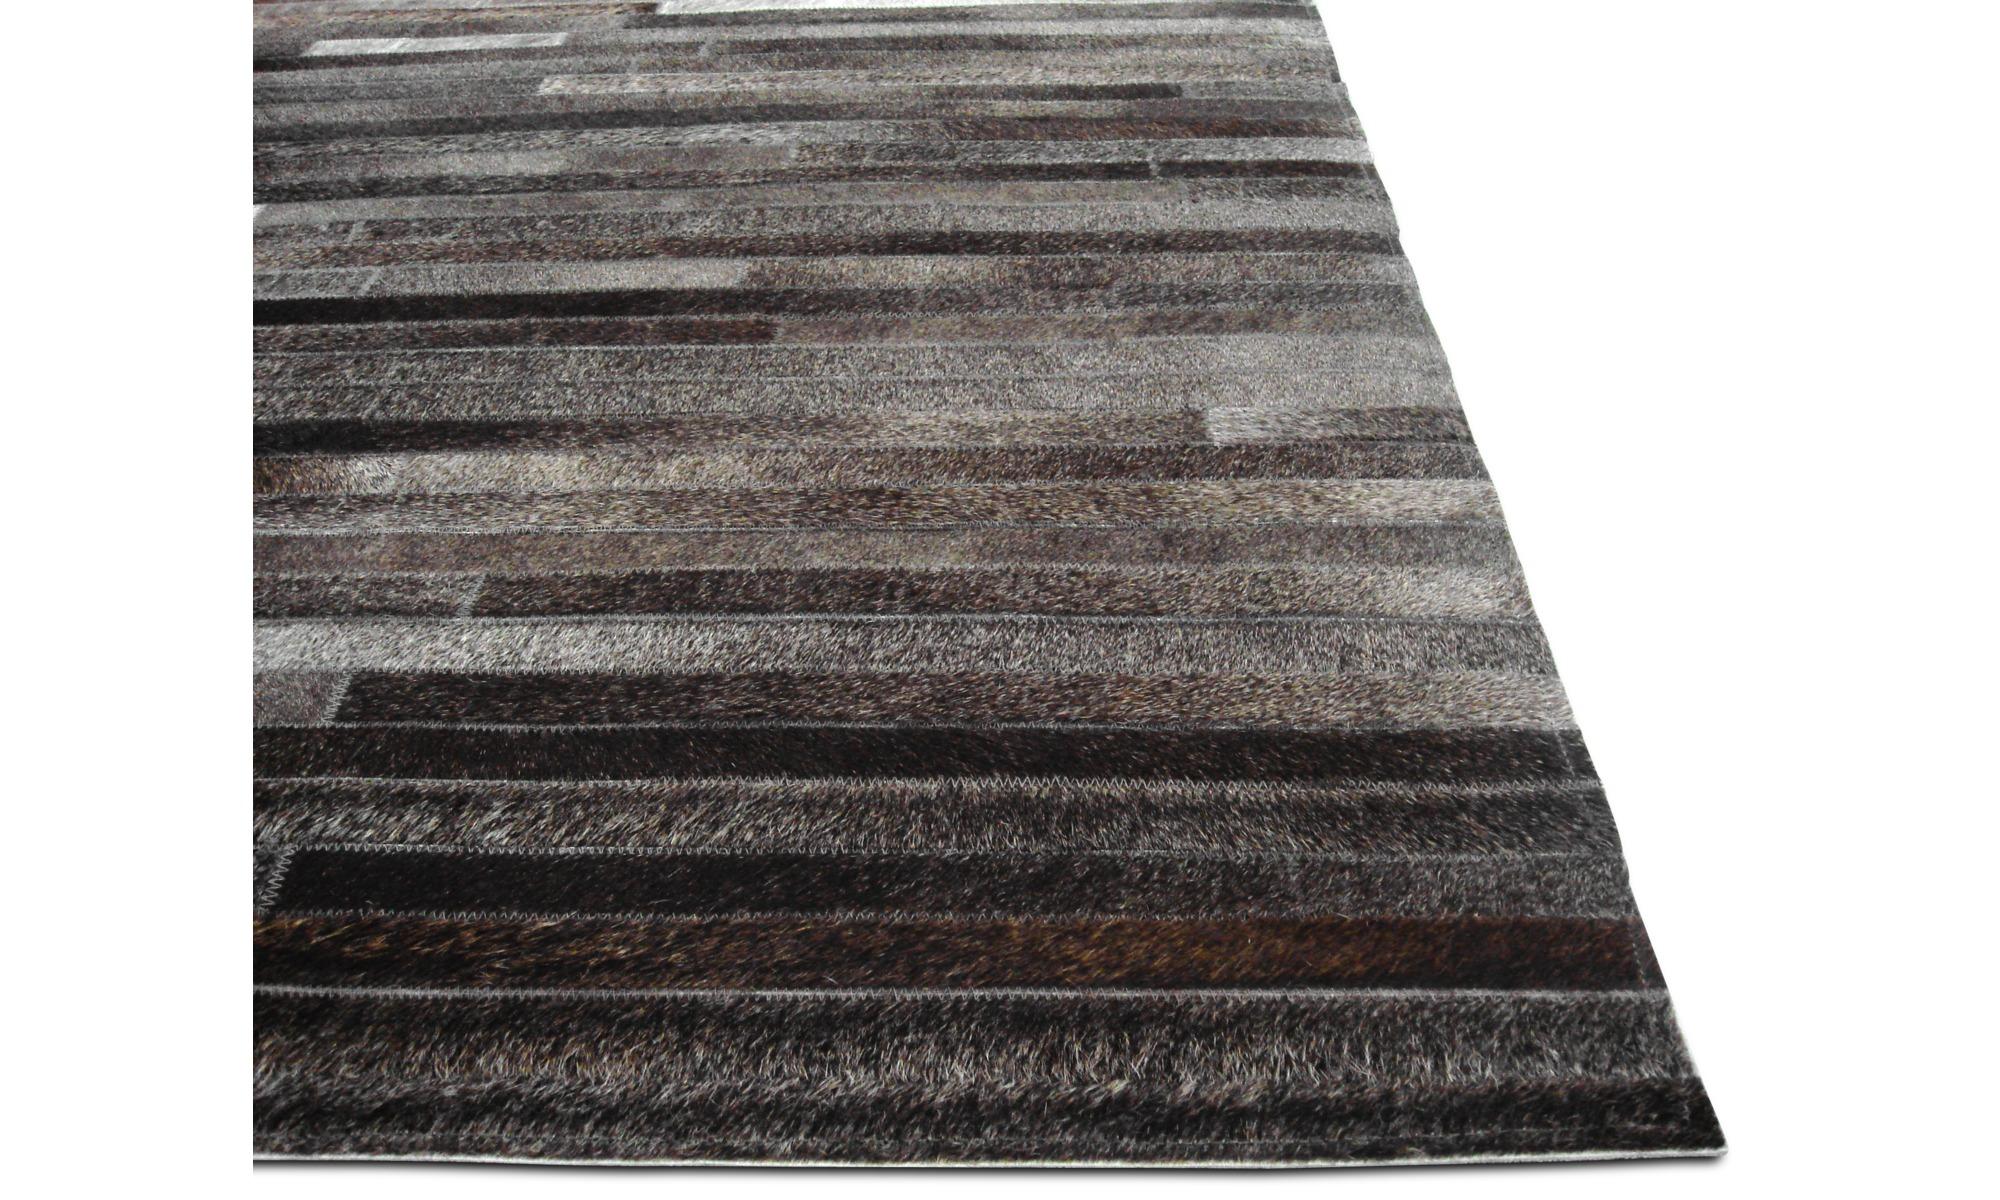 tapis cuir gris stunning tapis shaggy cuir blanc et gris. Black Bedroom Furniture Sets. Home Design Ideas